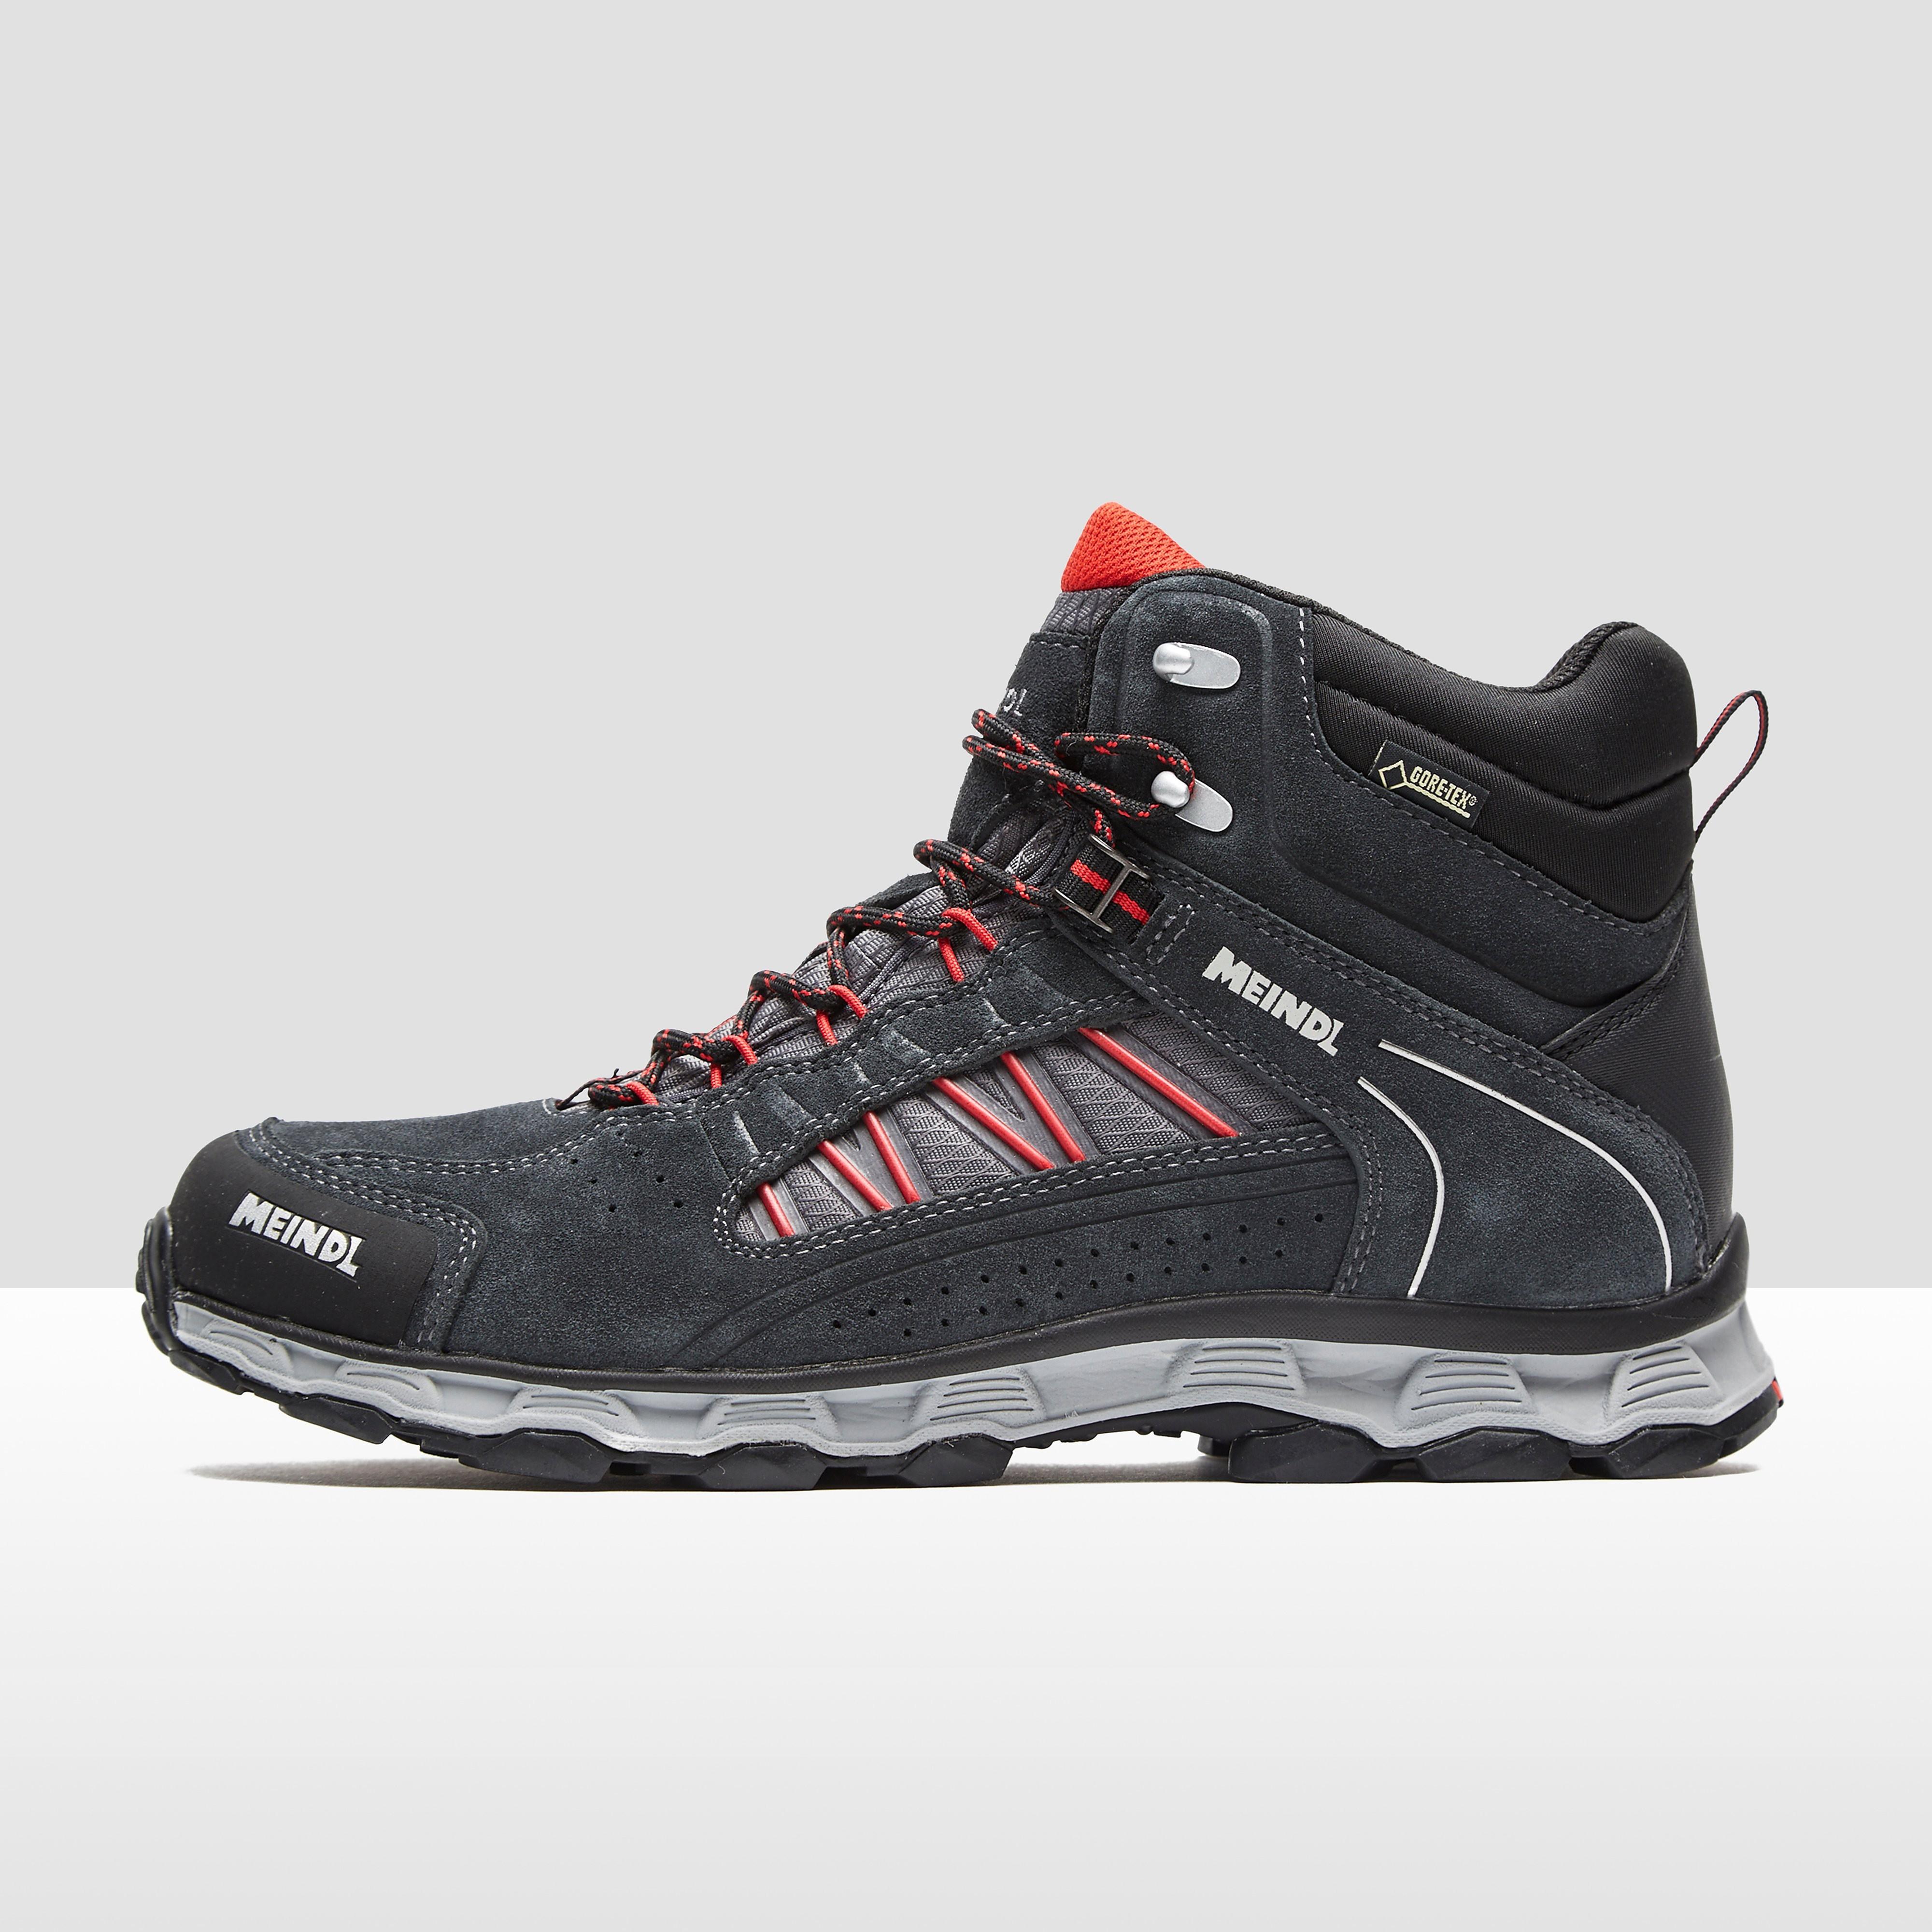 Meindl SX 2.5 Mid GTX Men's Hiking Boots